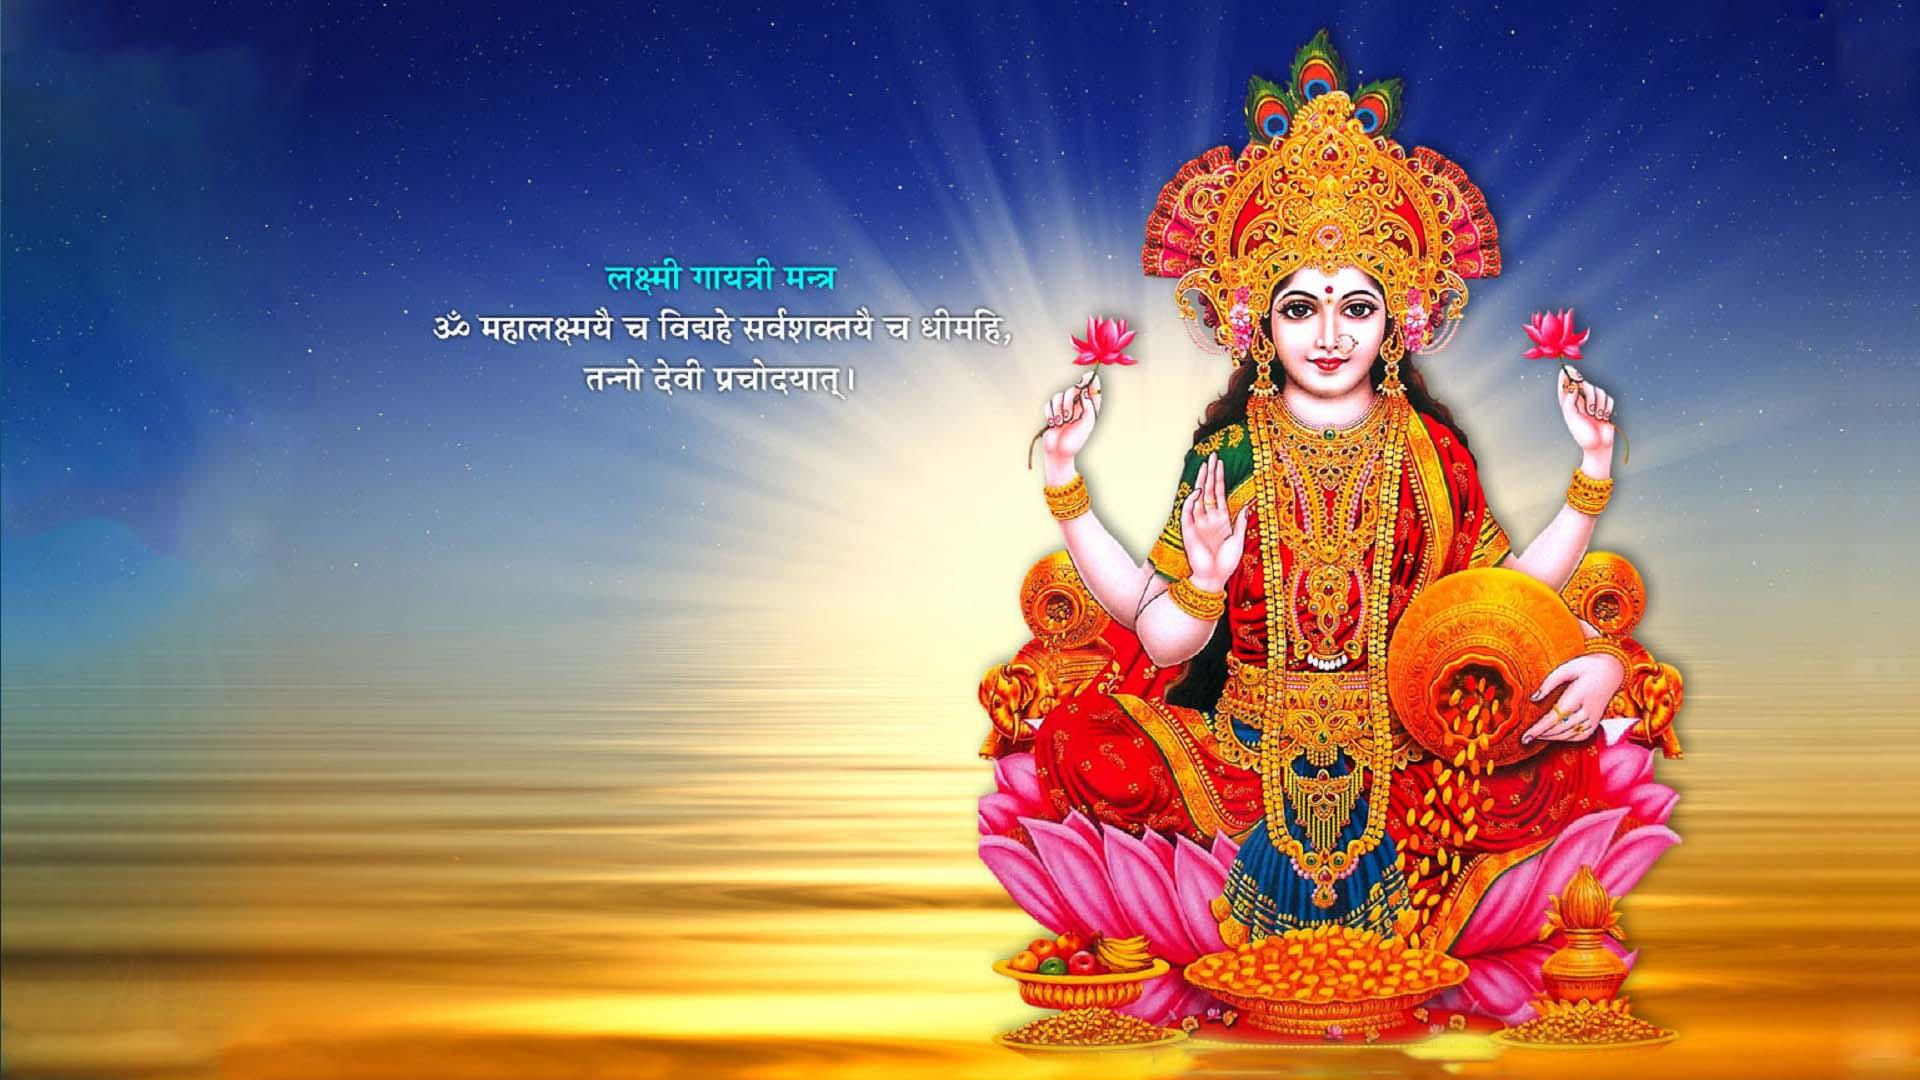 Laxmi Beej Mantra Free Download